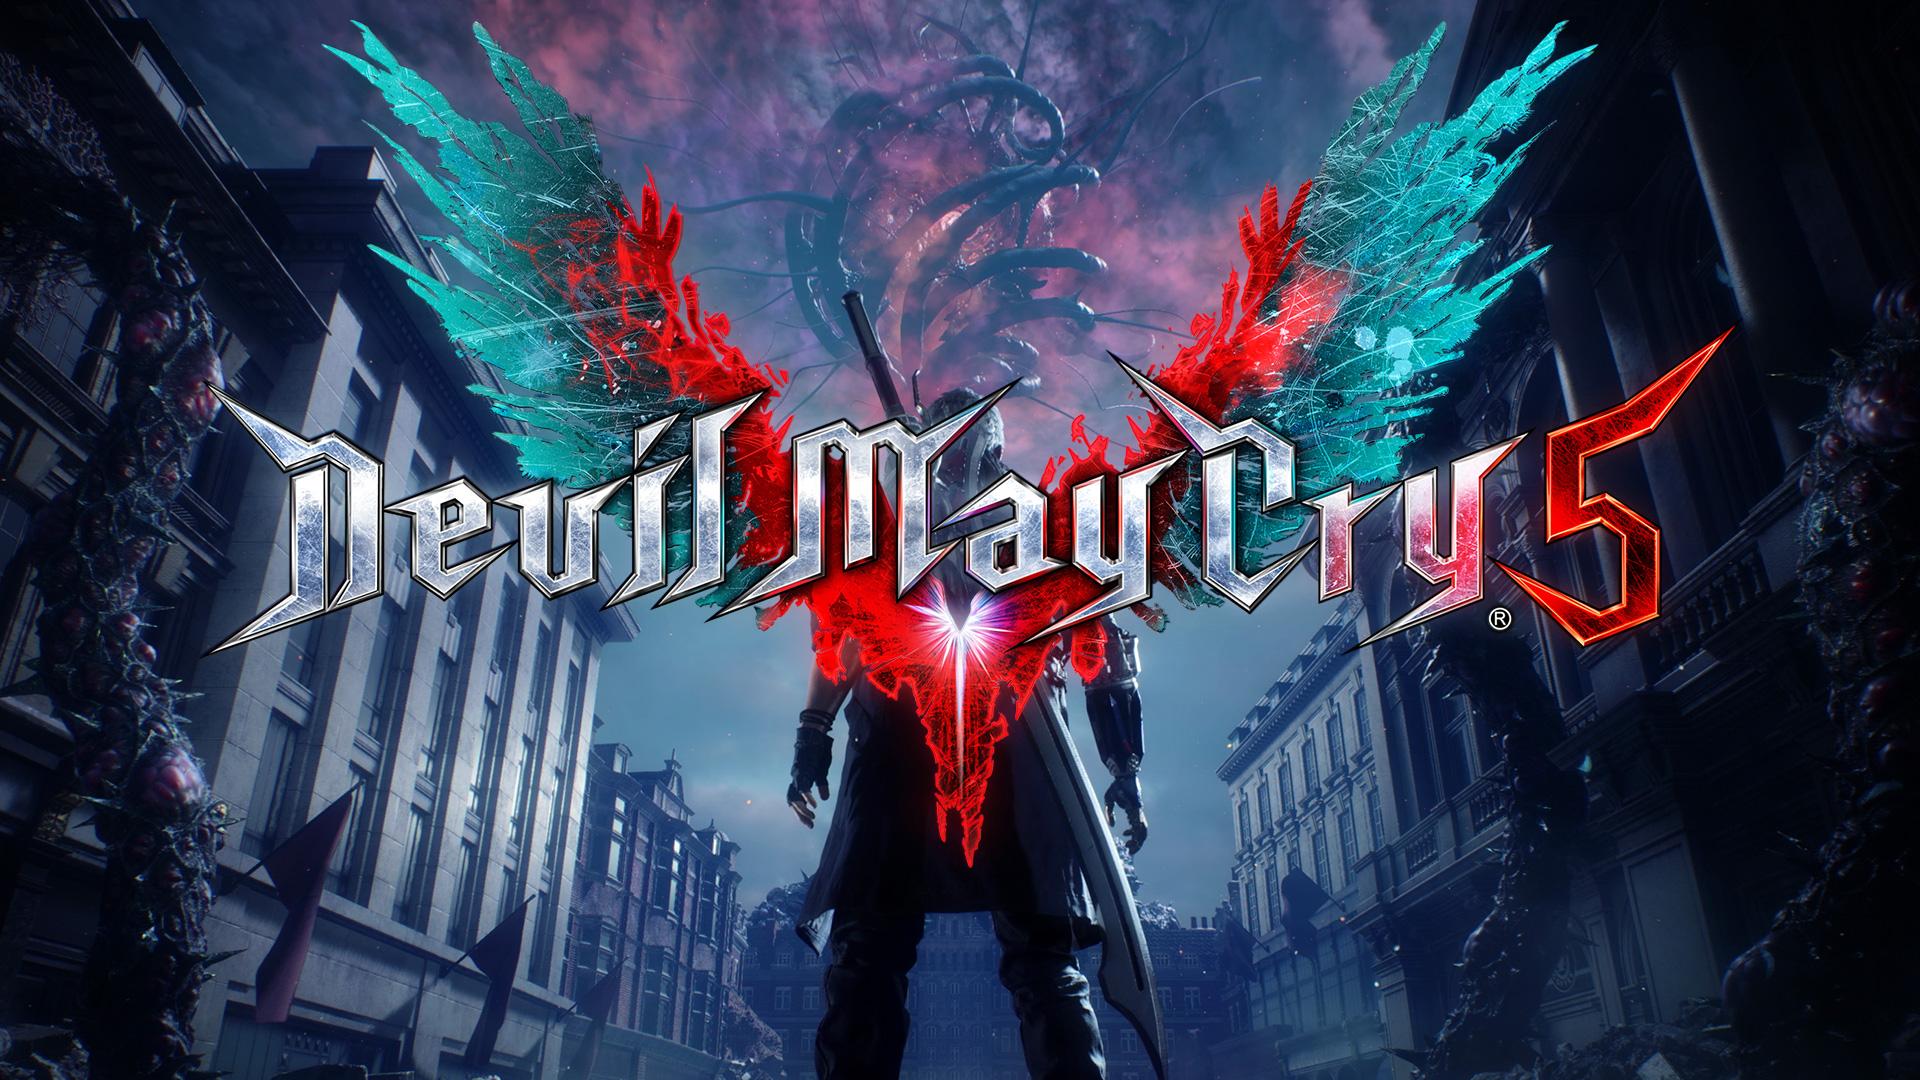 Devil-May-Cry-5-livestream.jpg